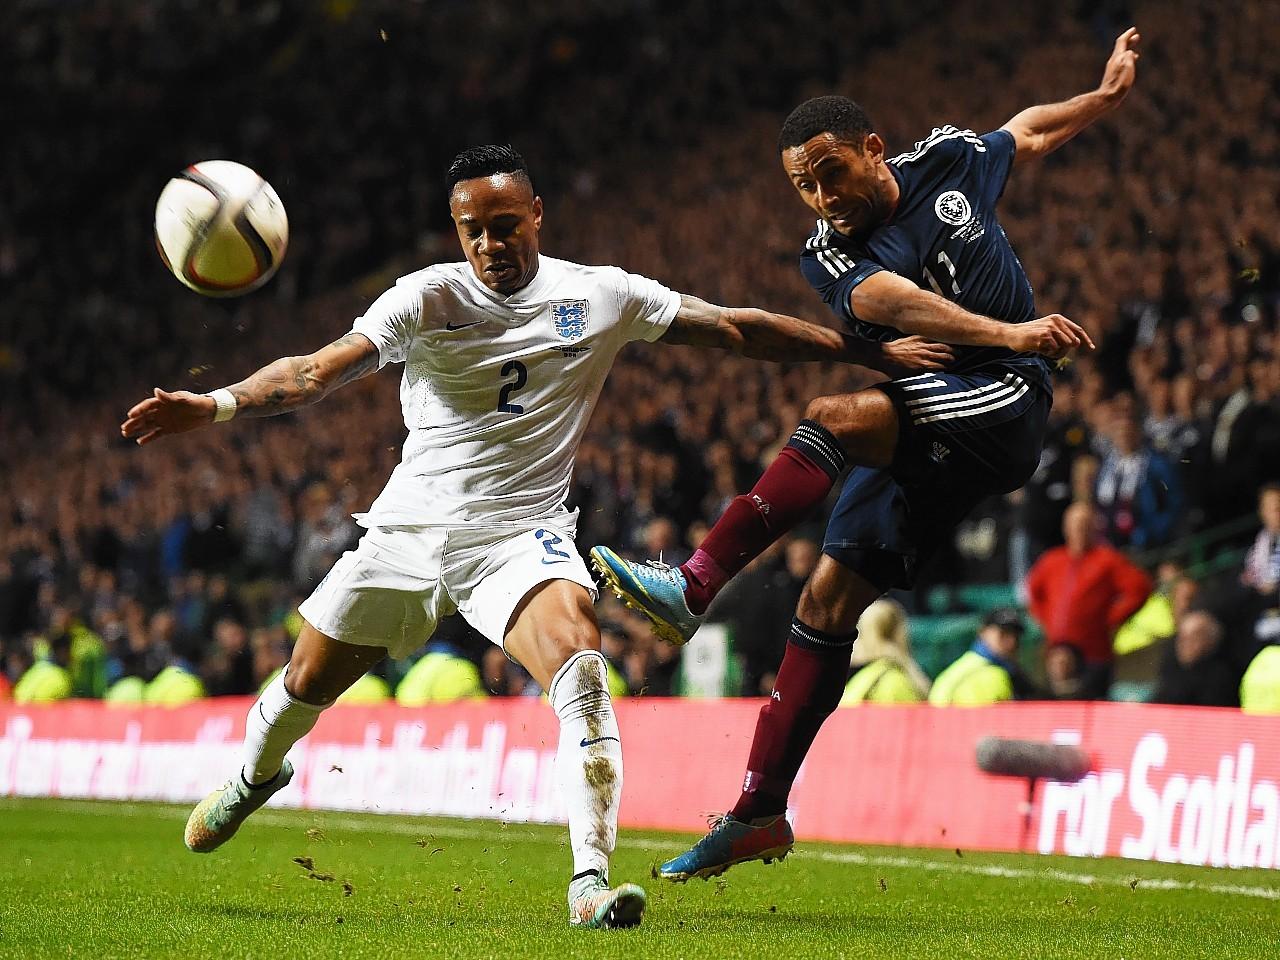 Ikechi Anya takes on England right back Nathaniel Clyne